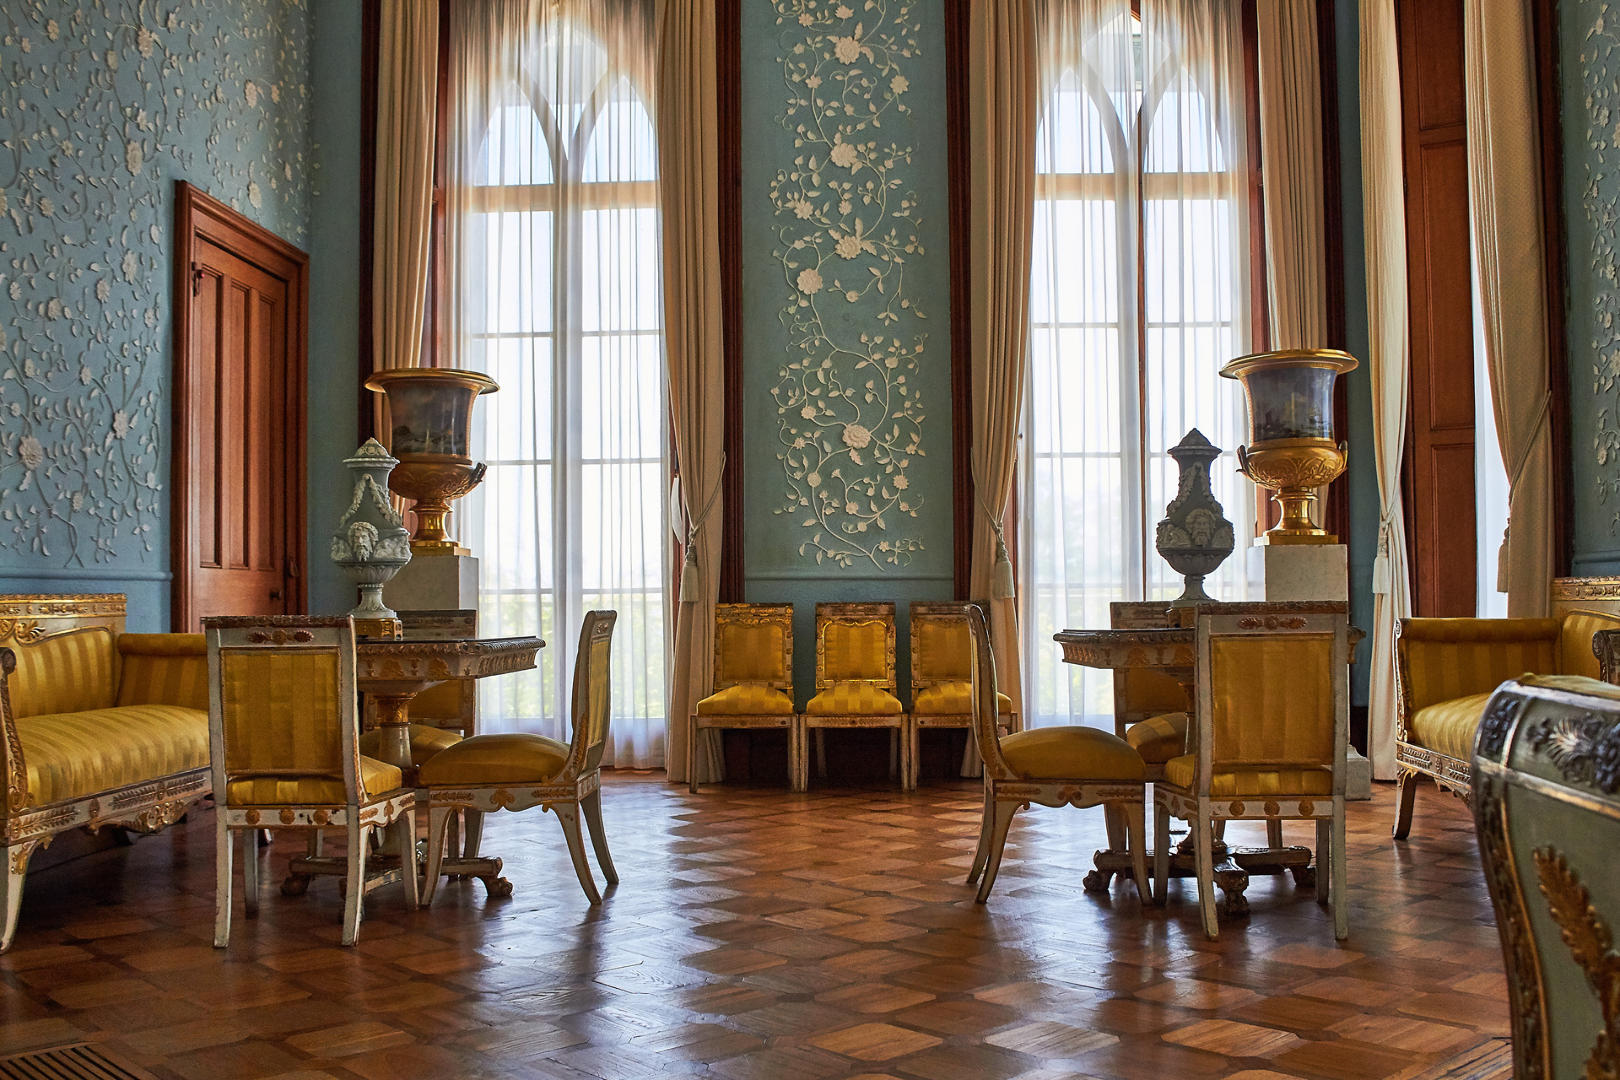 Воронцовский дворец голубая комната фото